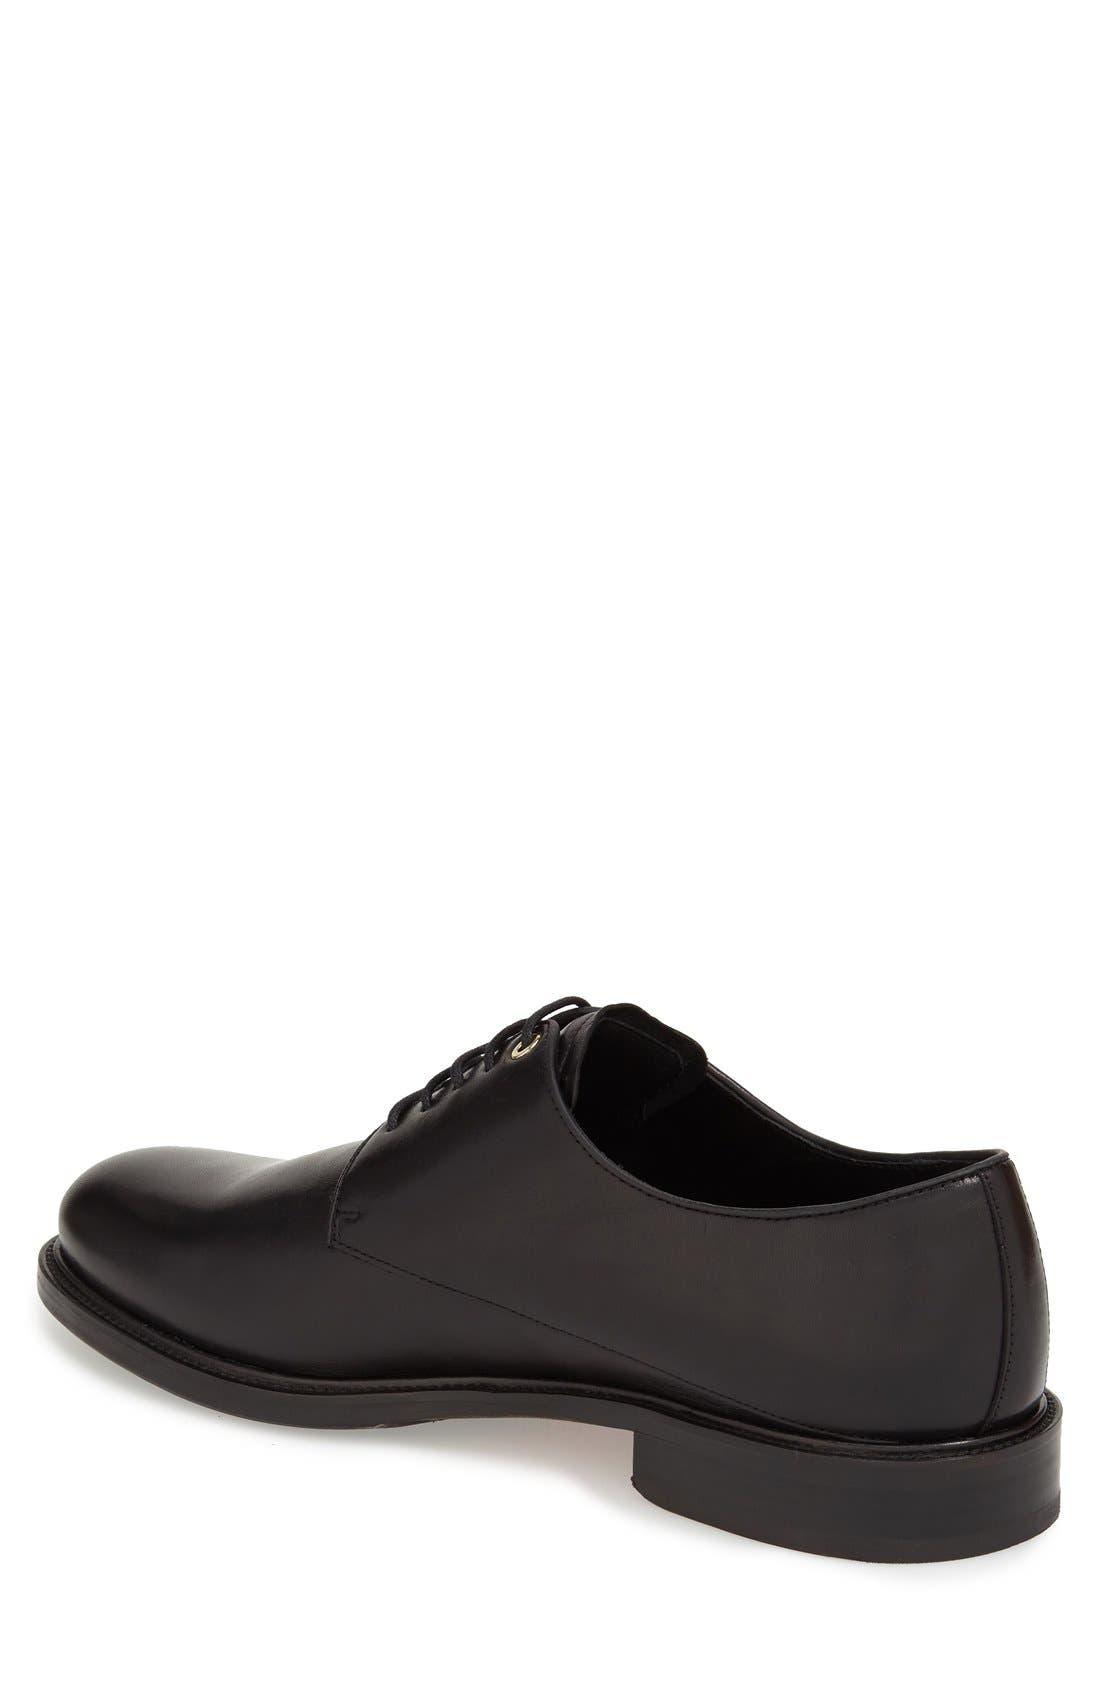 'Benson' Plain Toe Derby,                             Alternate thumbnail 2, color,                             Box Black Leather